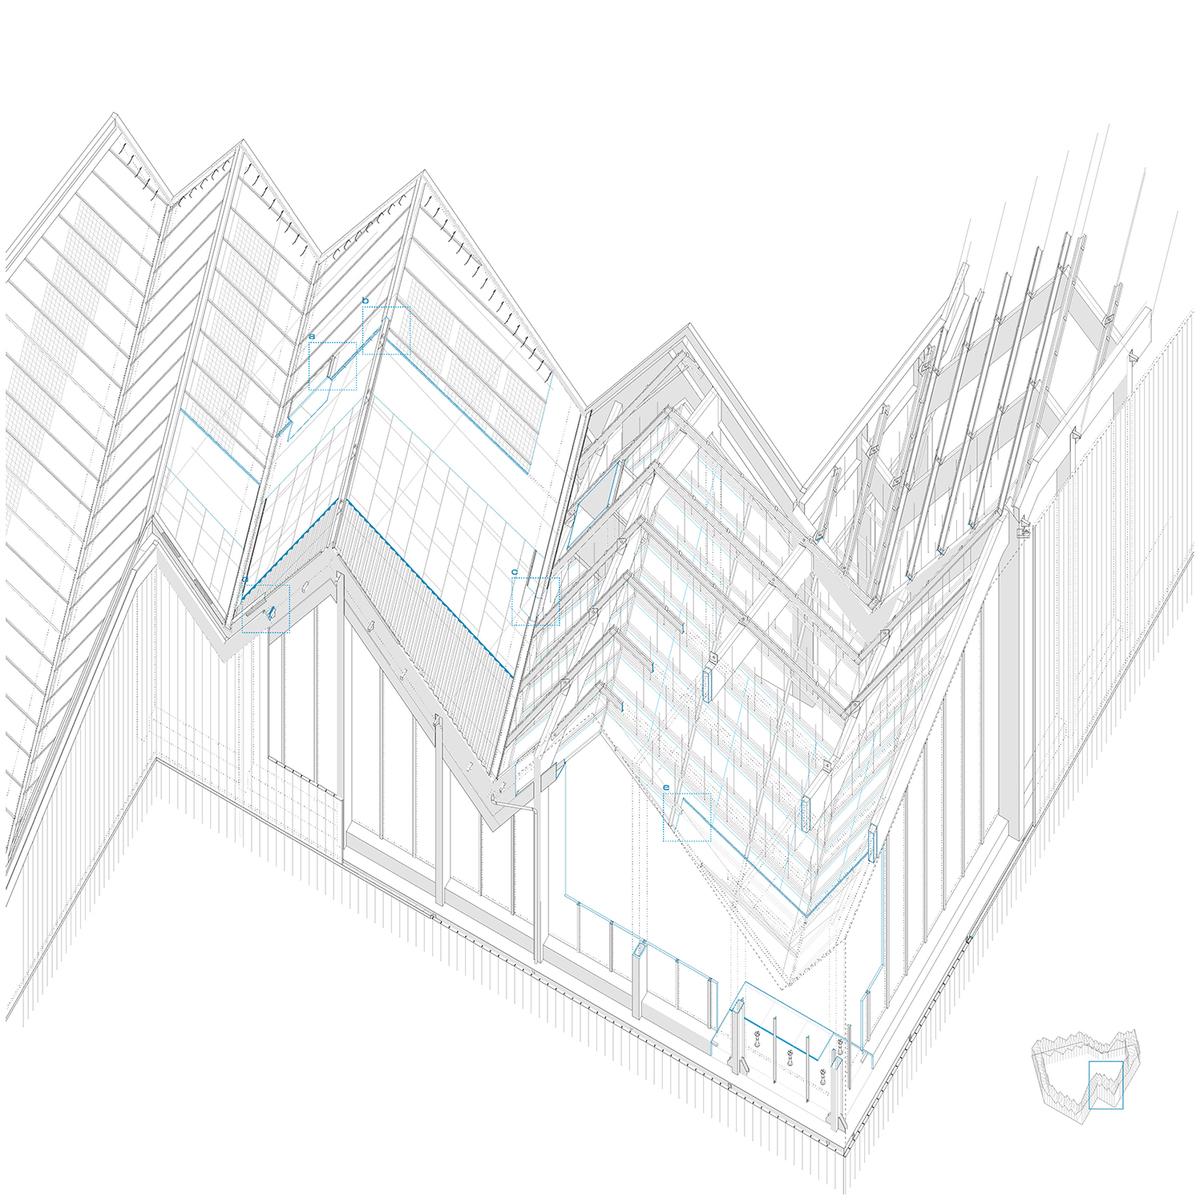 construction axonometric view